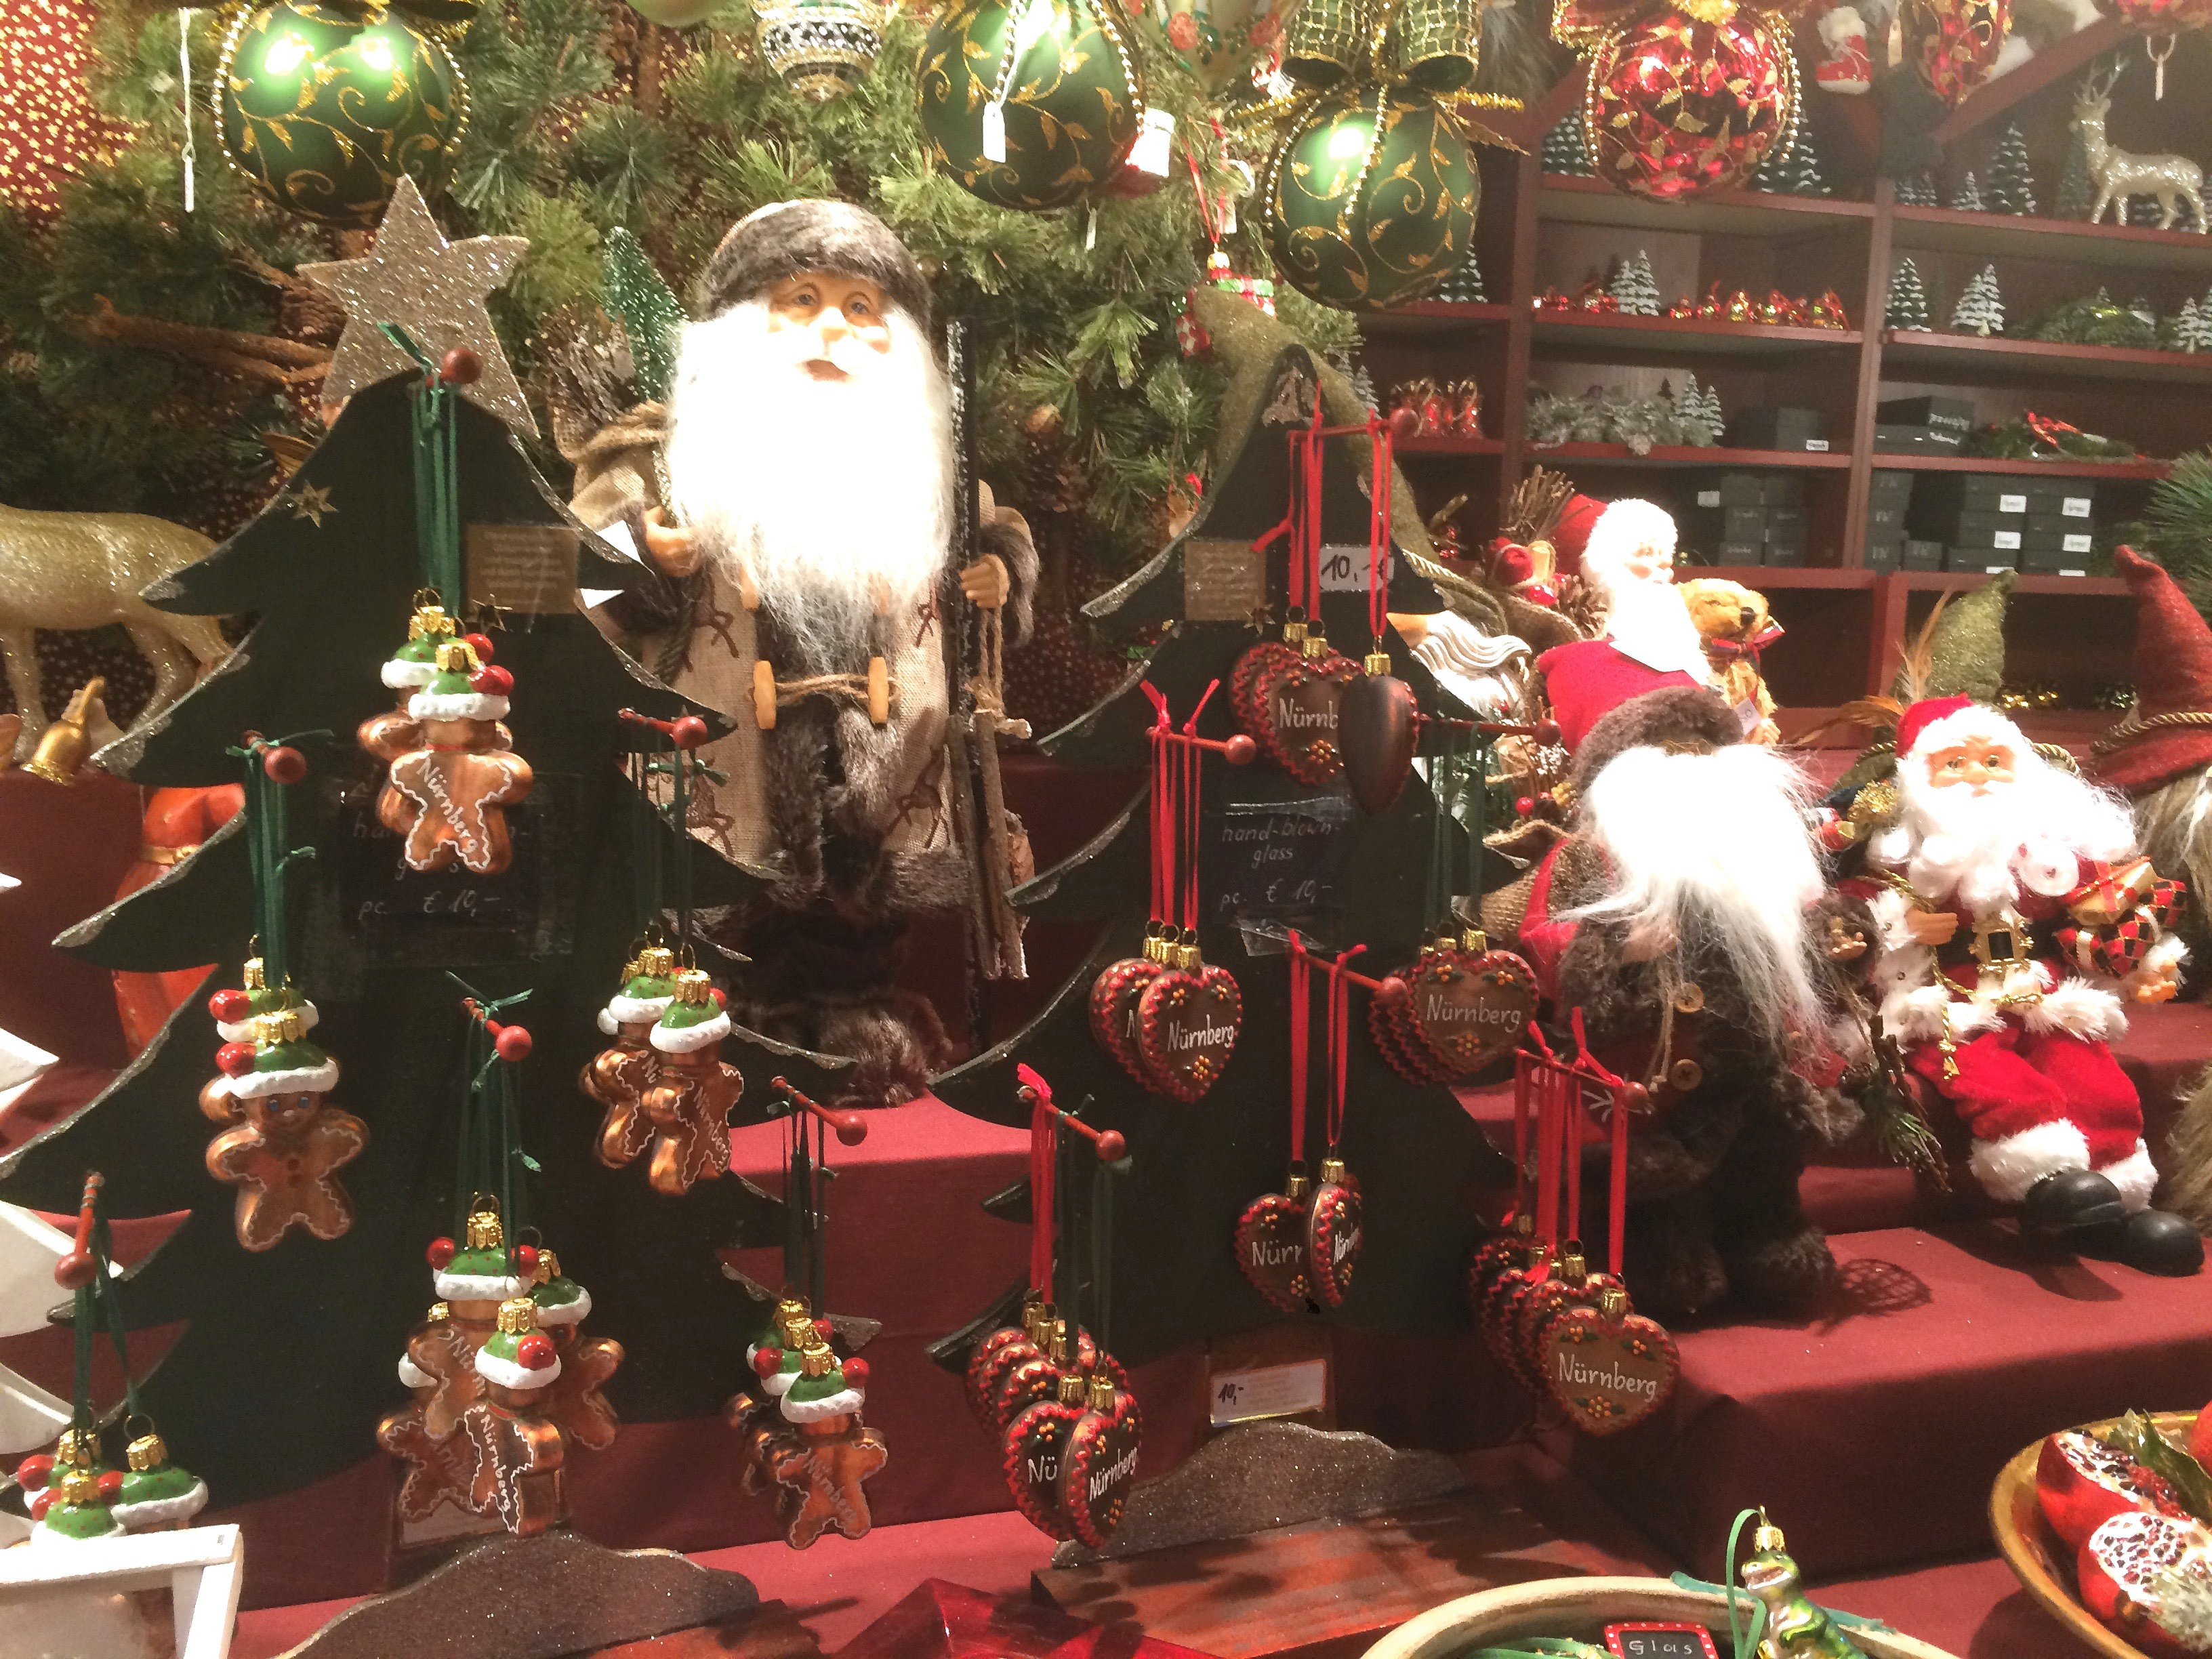 Santa gets everywhere.